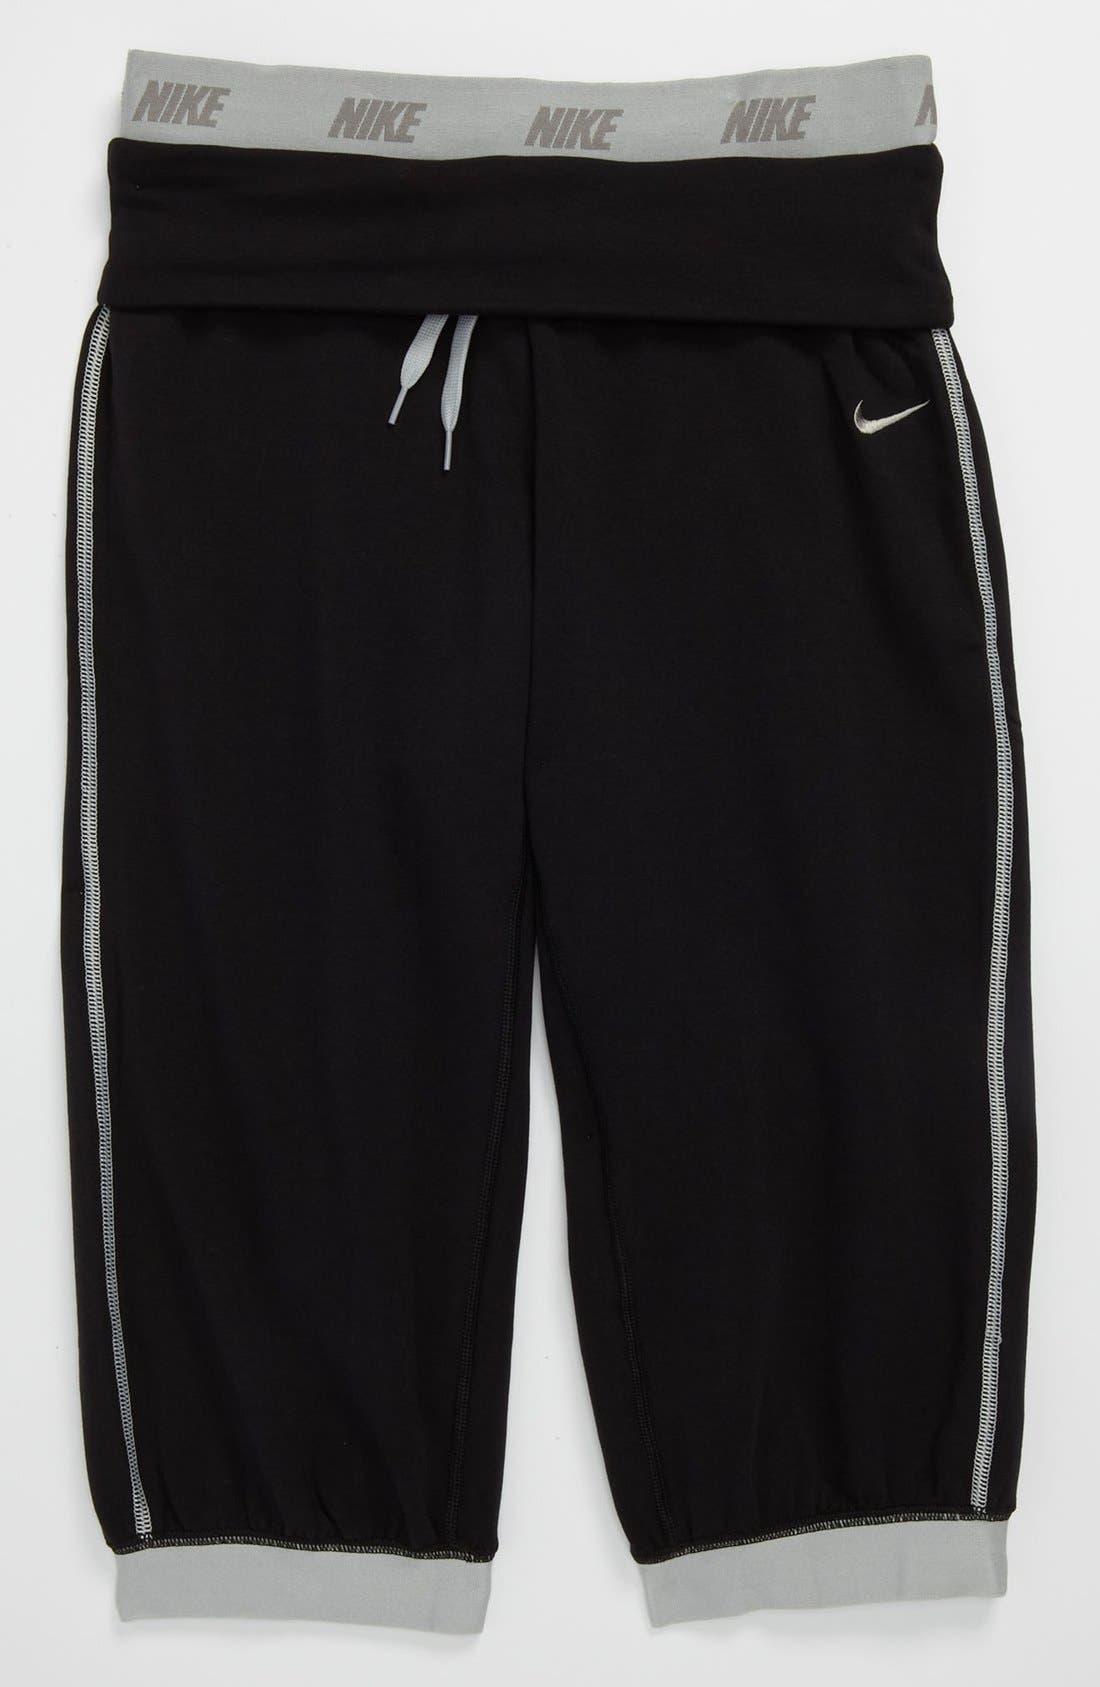 Main Image - Nike 'Victory' Capri Pants (Big Girls)